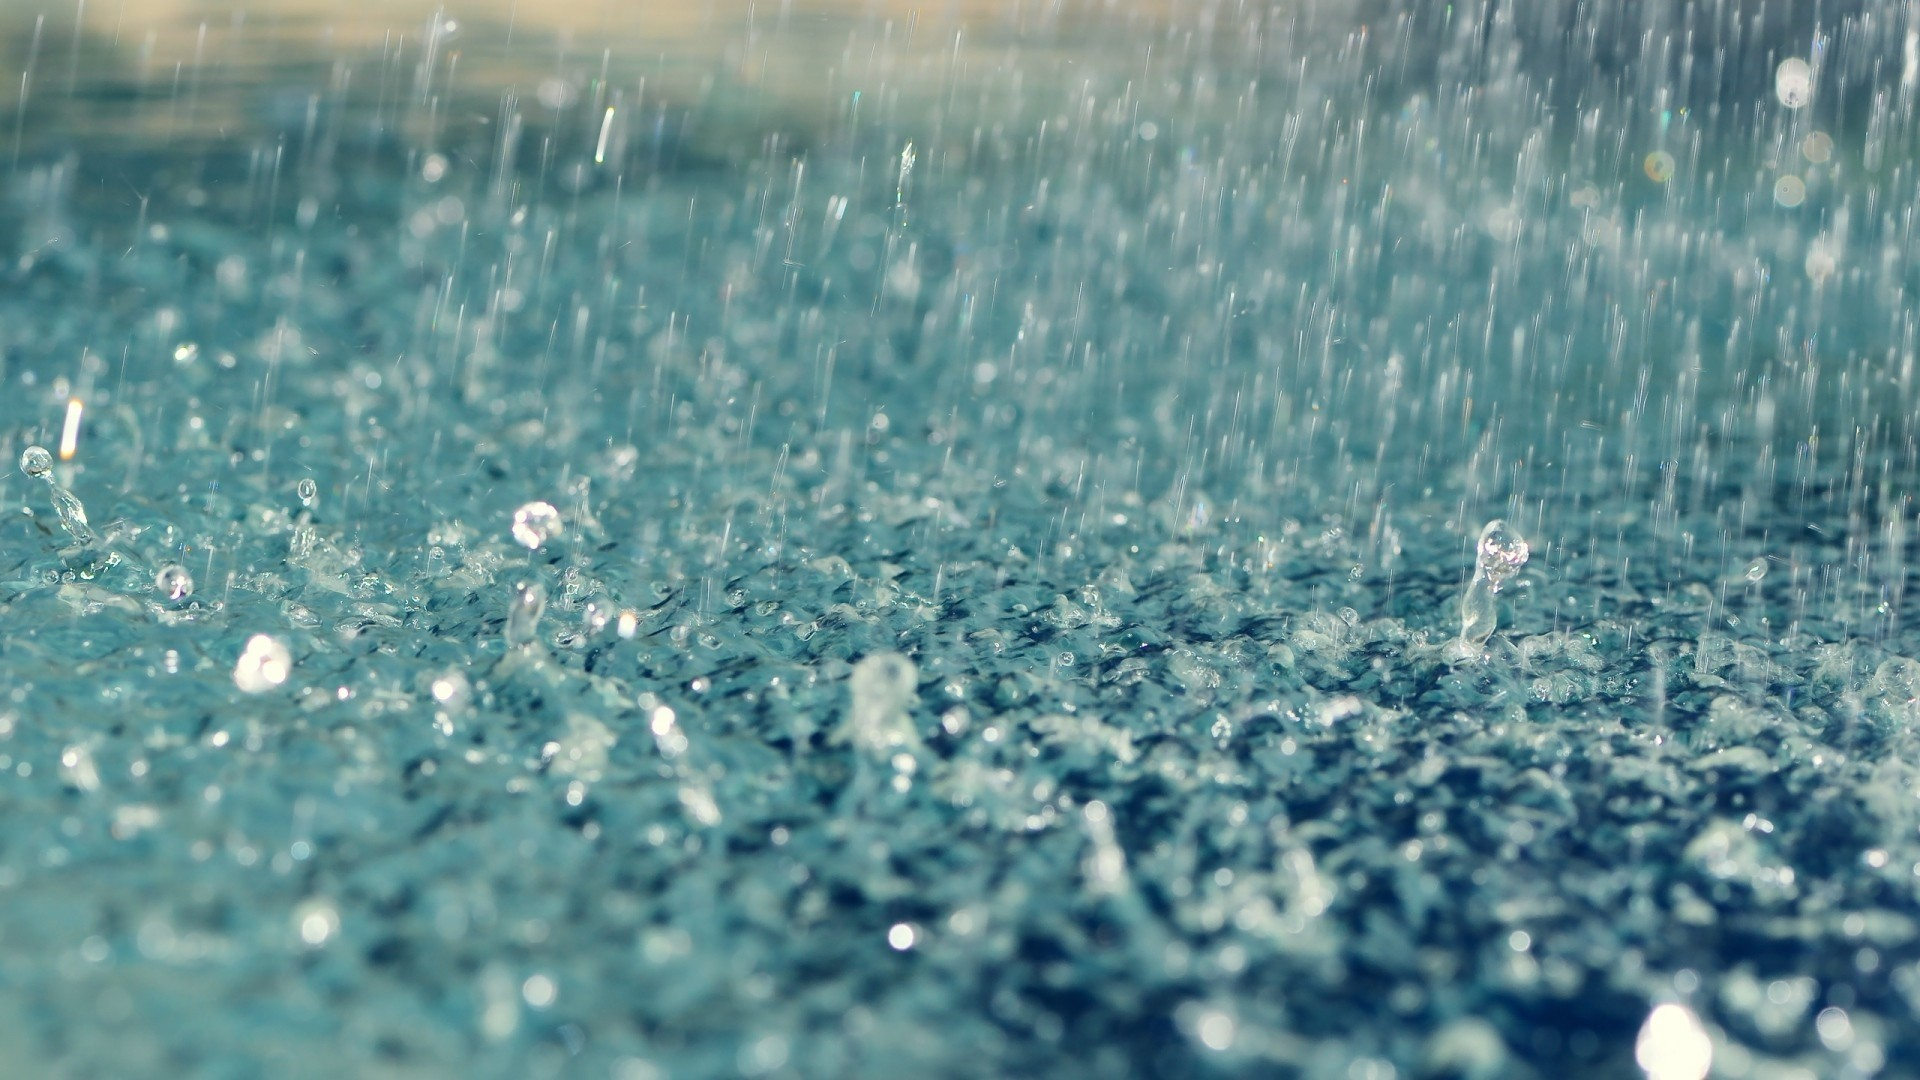 Rain Wallpaper for pc